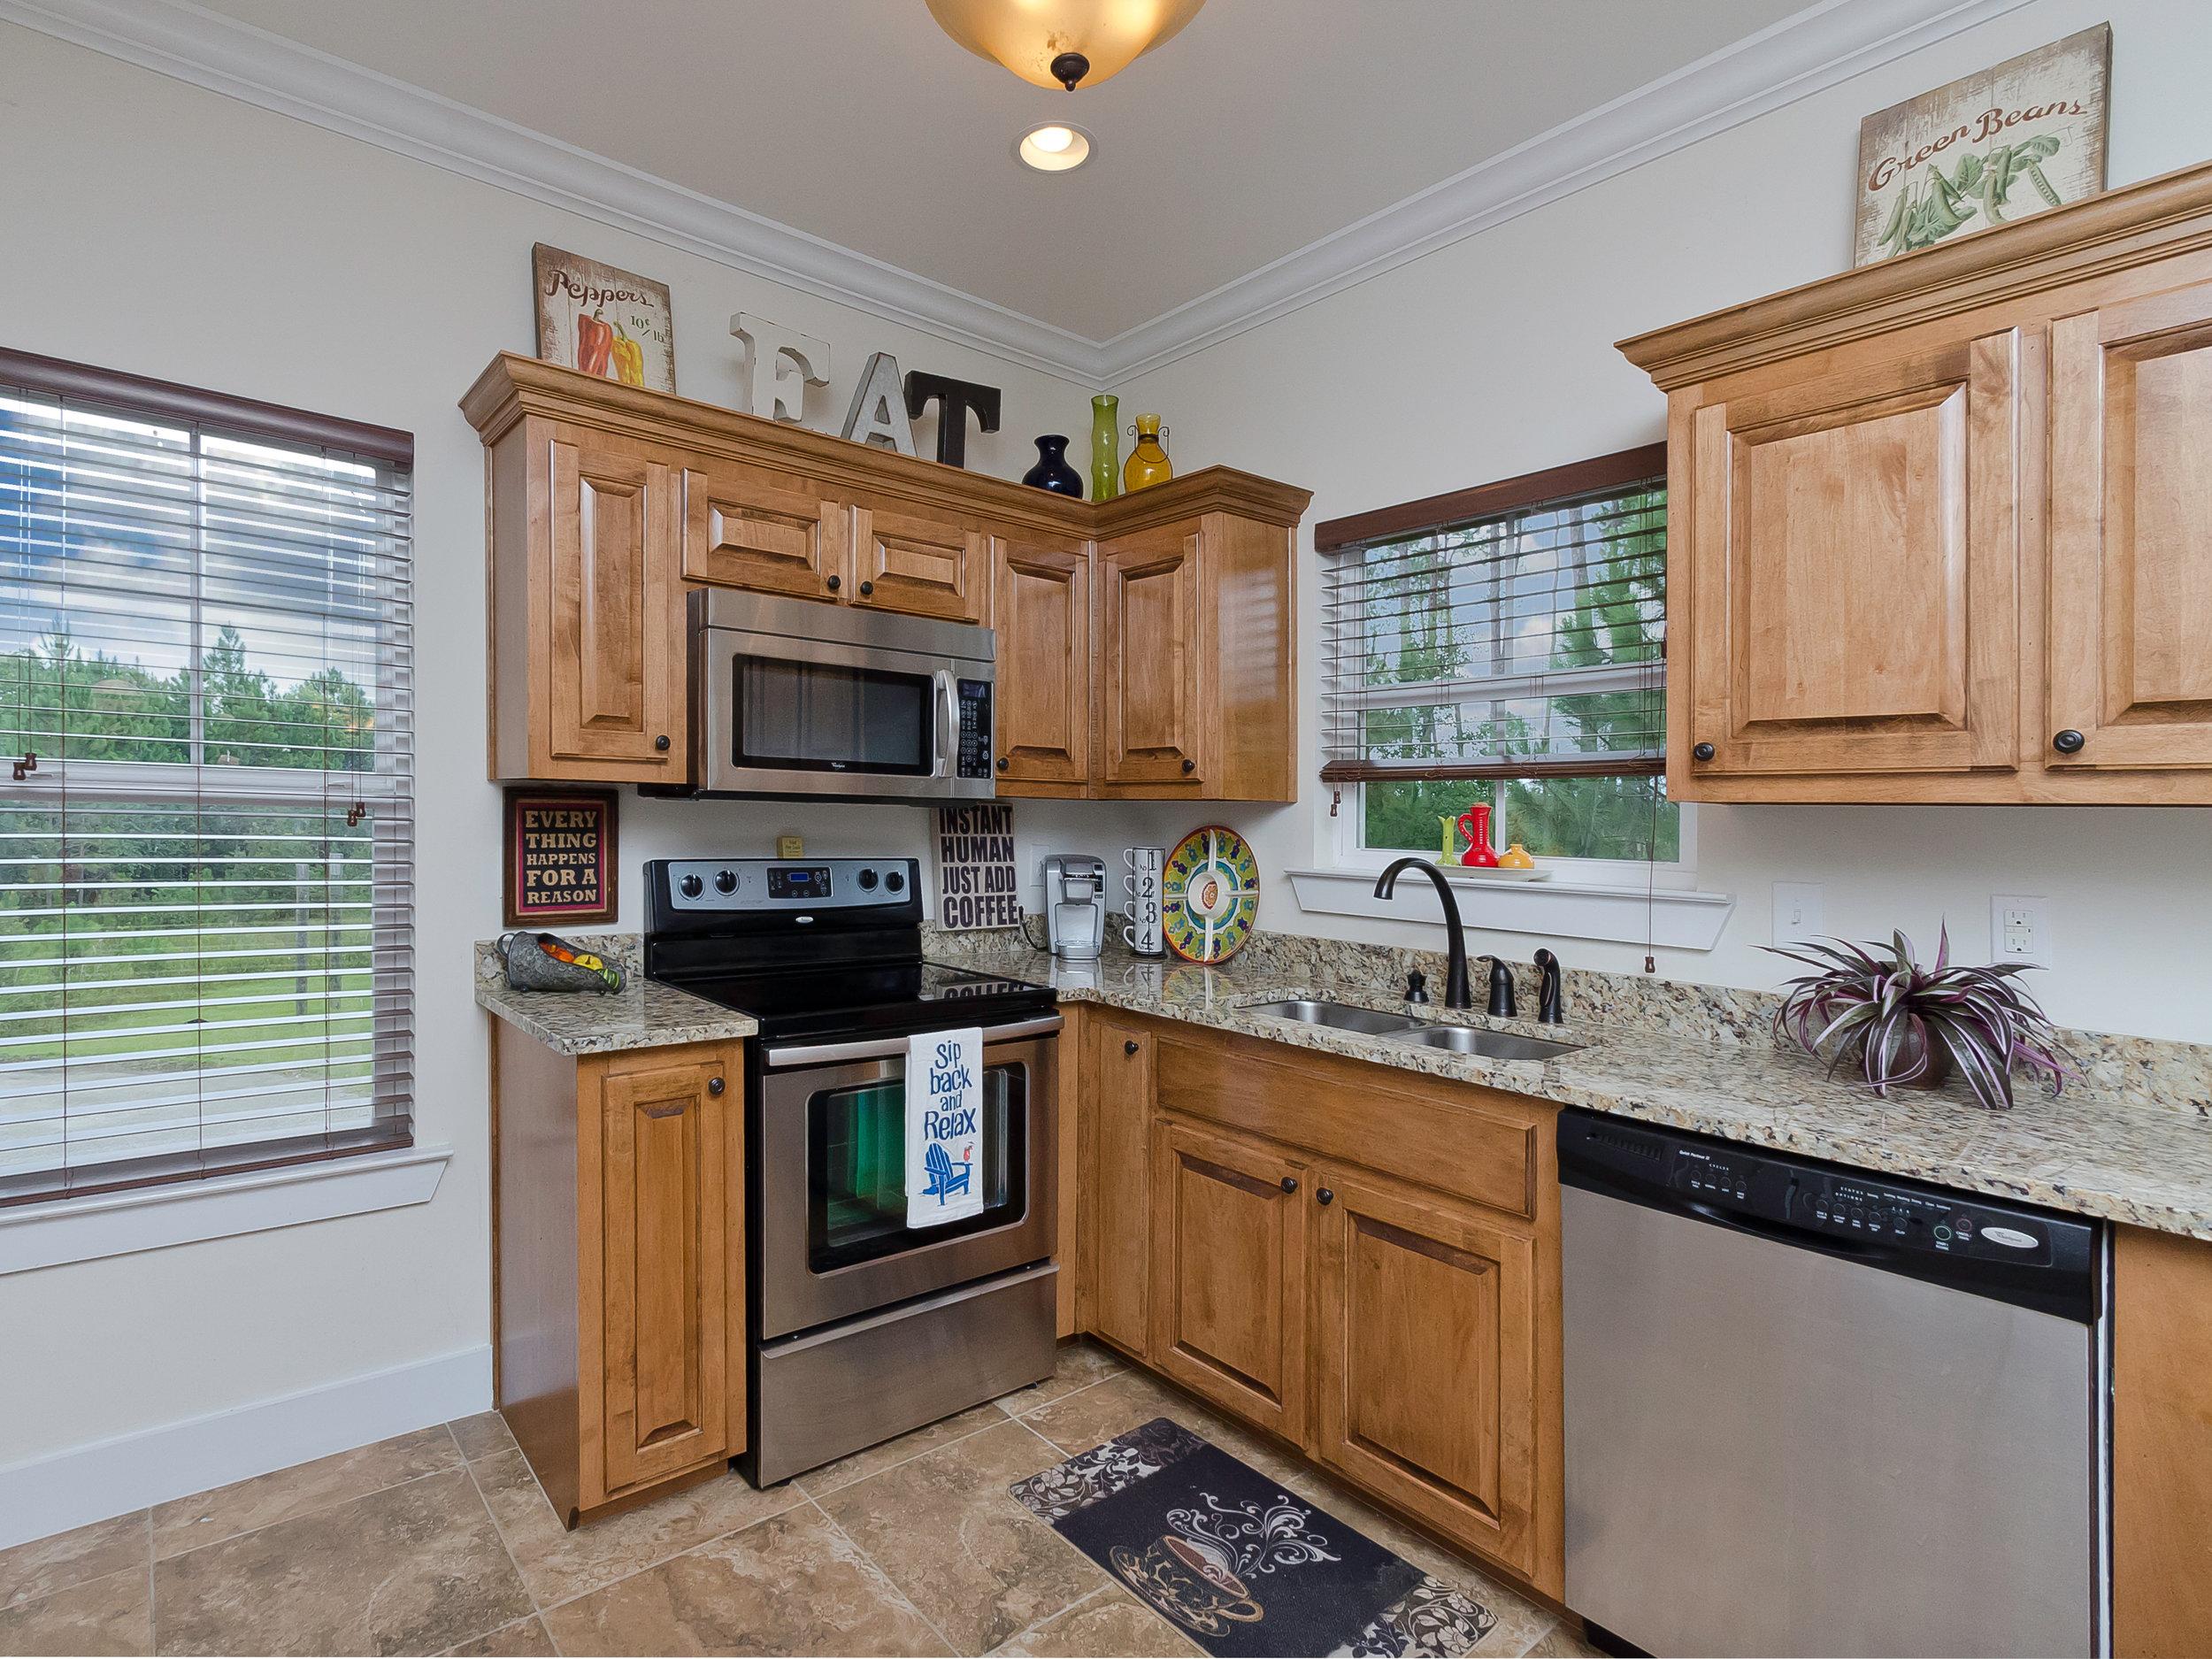 5 Kitchen_JOB3489.jpg